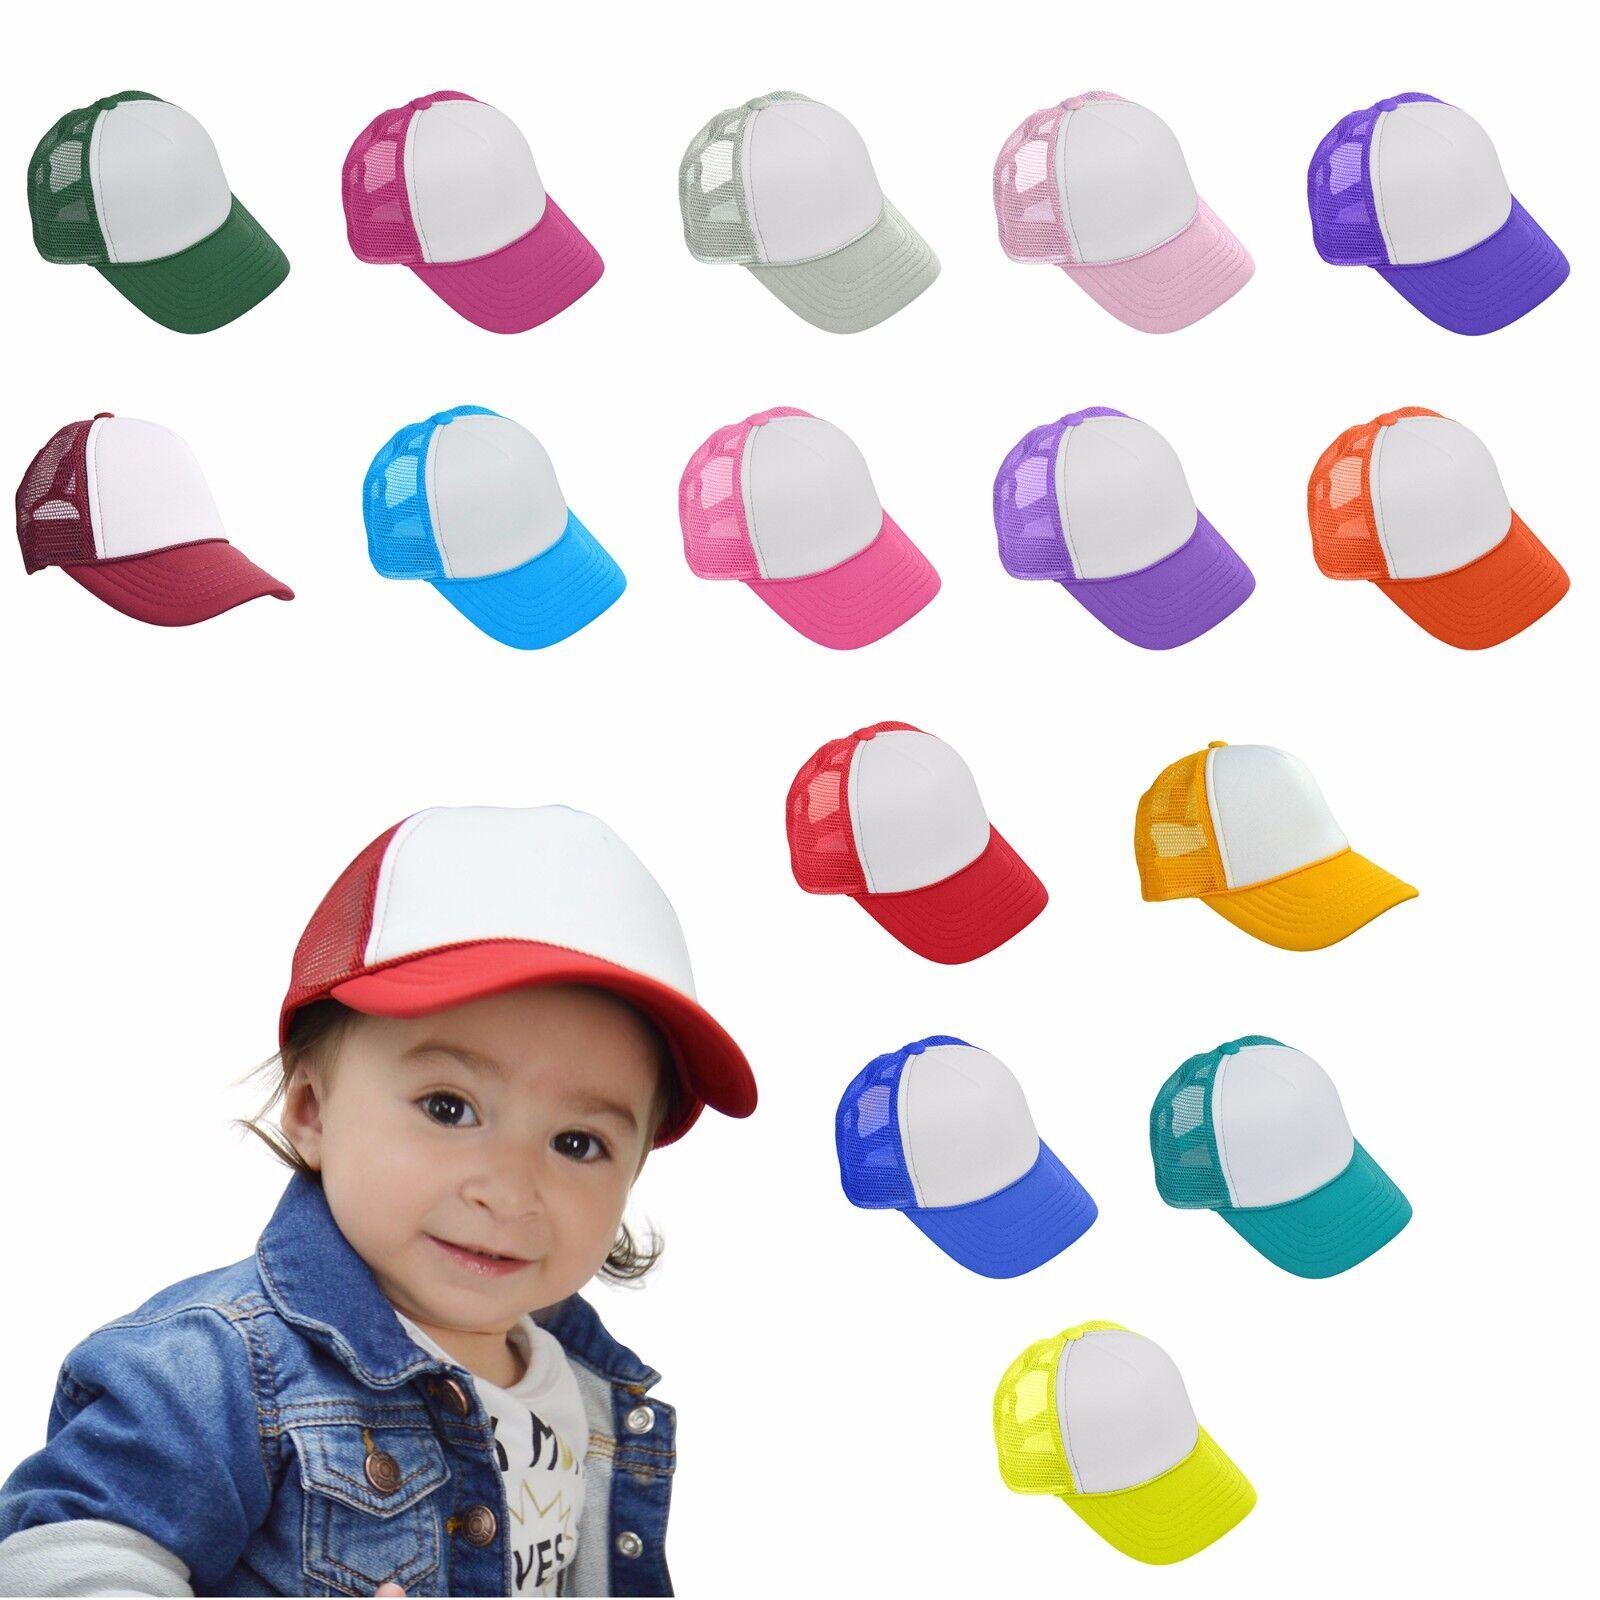 DALIX Infant Trucker Hat Baby Cap Tiny Extra Small Girls Boys Boys